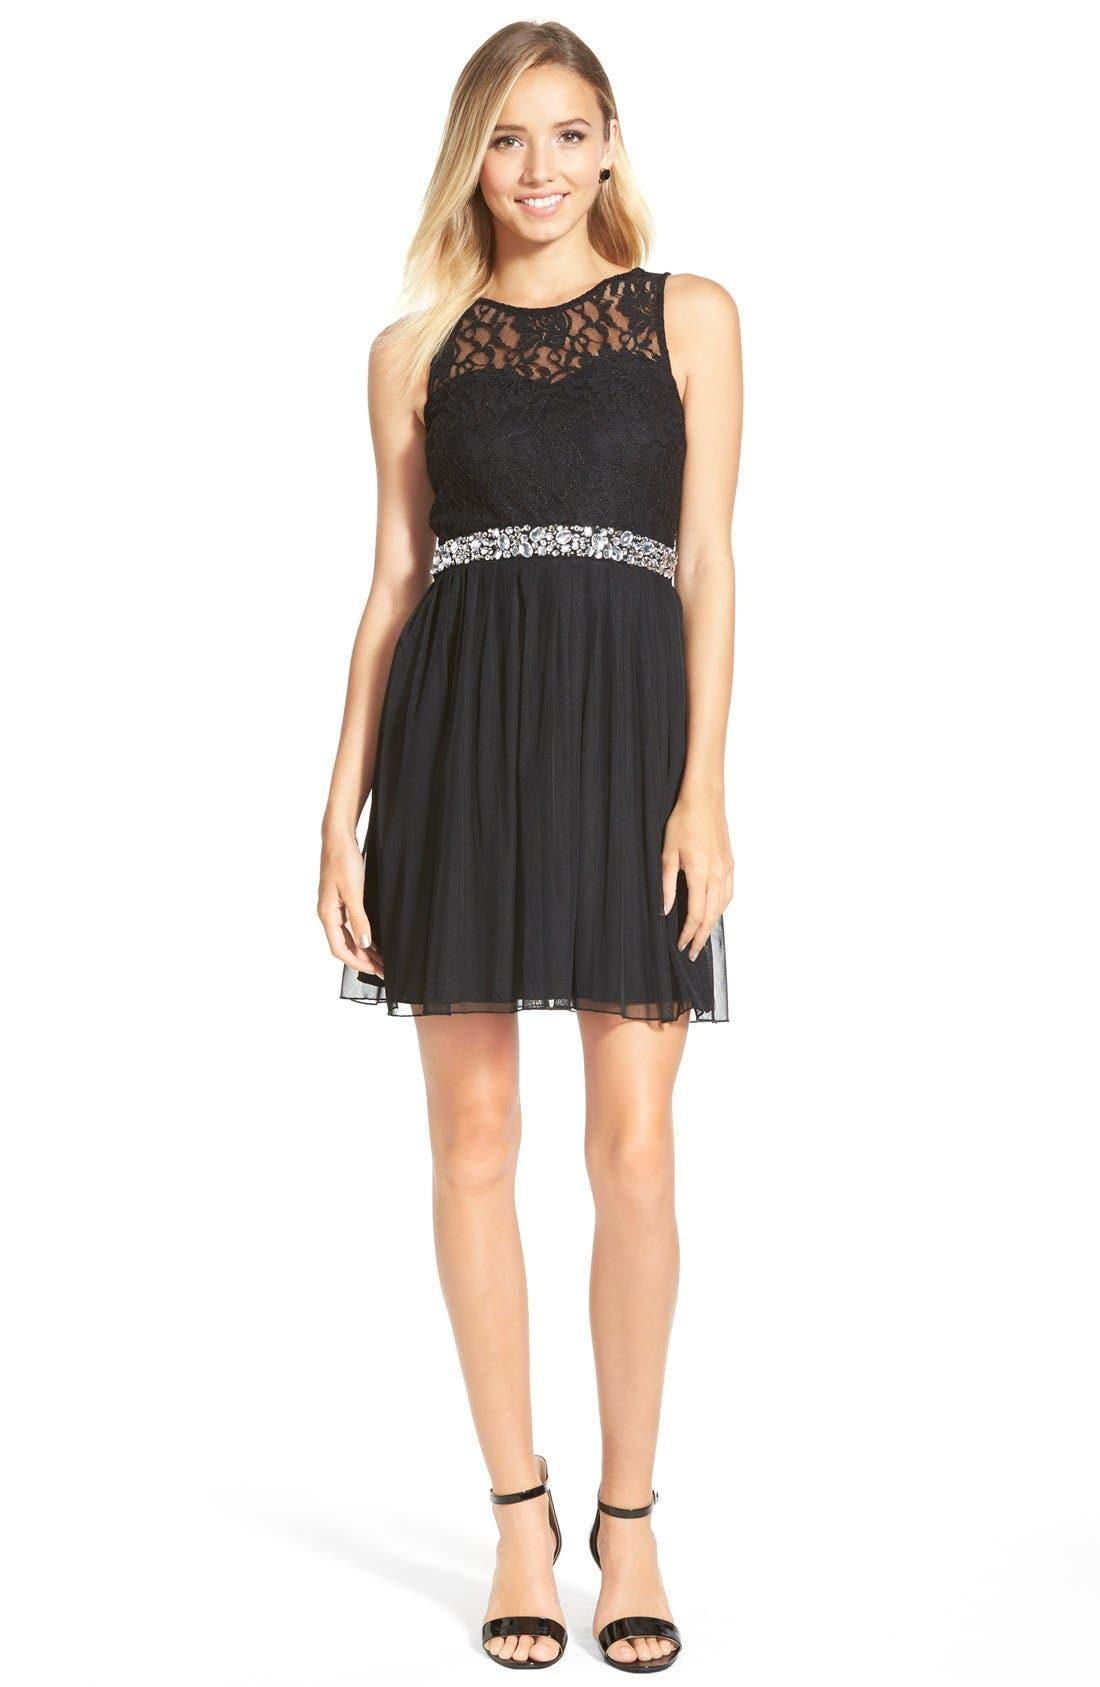 Main Image - Speechless Embellished Lace Bodice Skater Dress (Juniors)